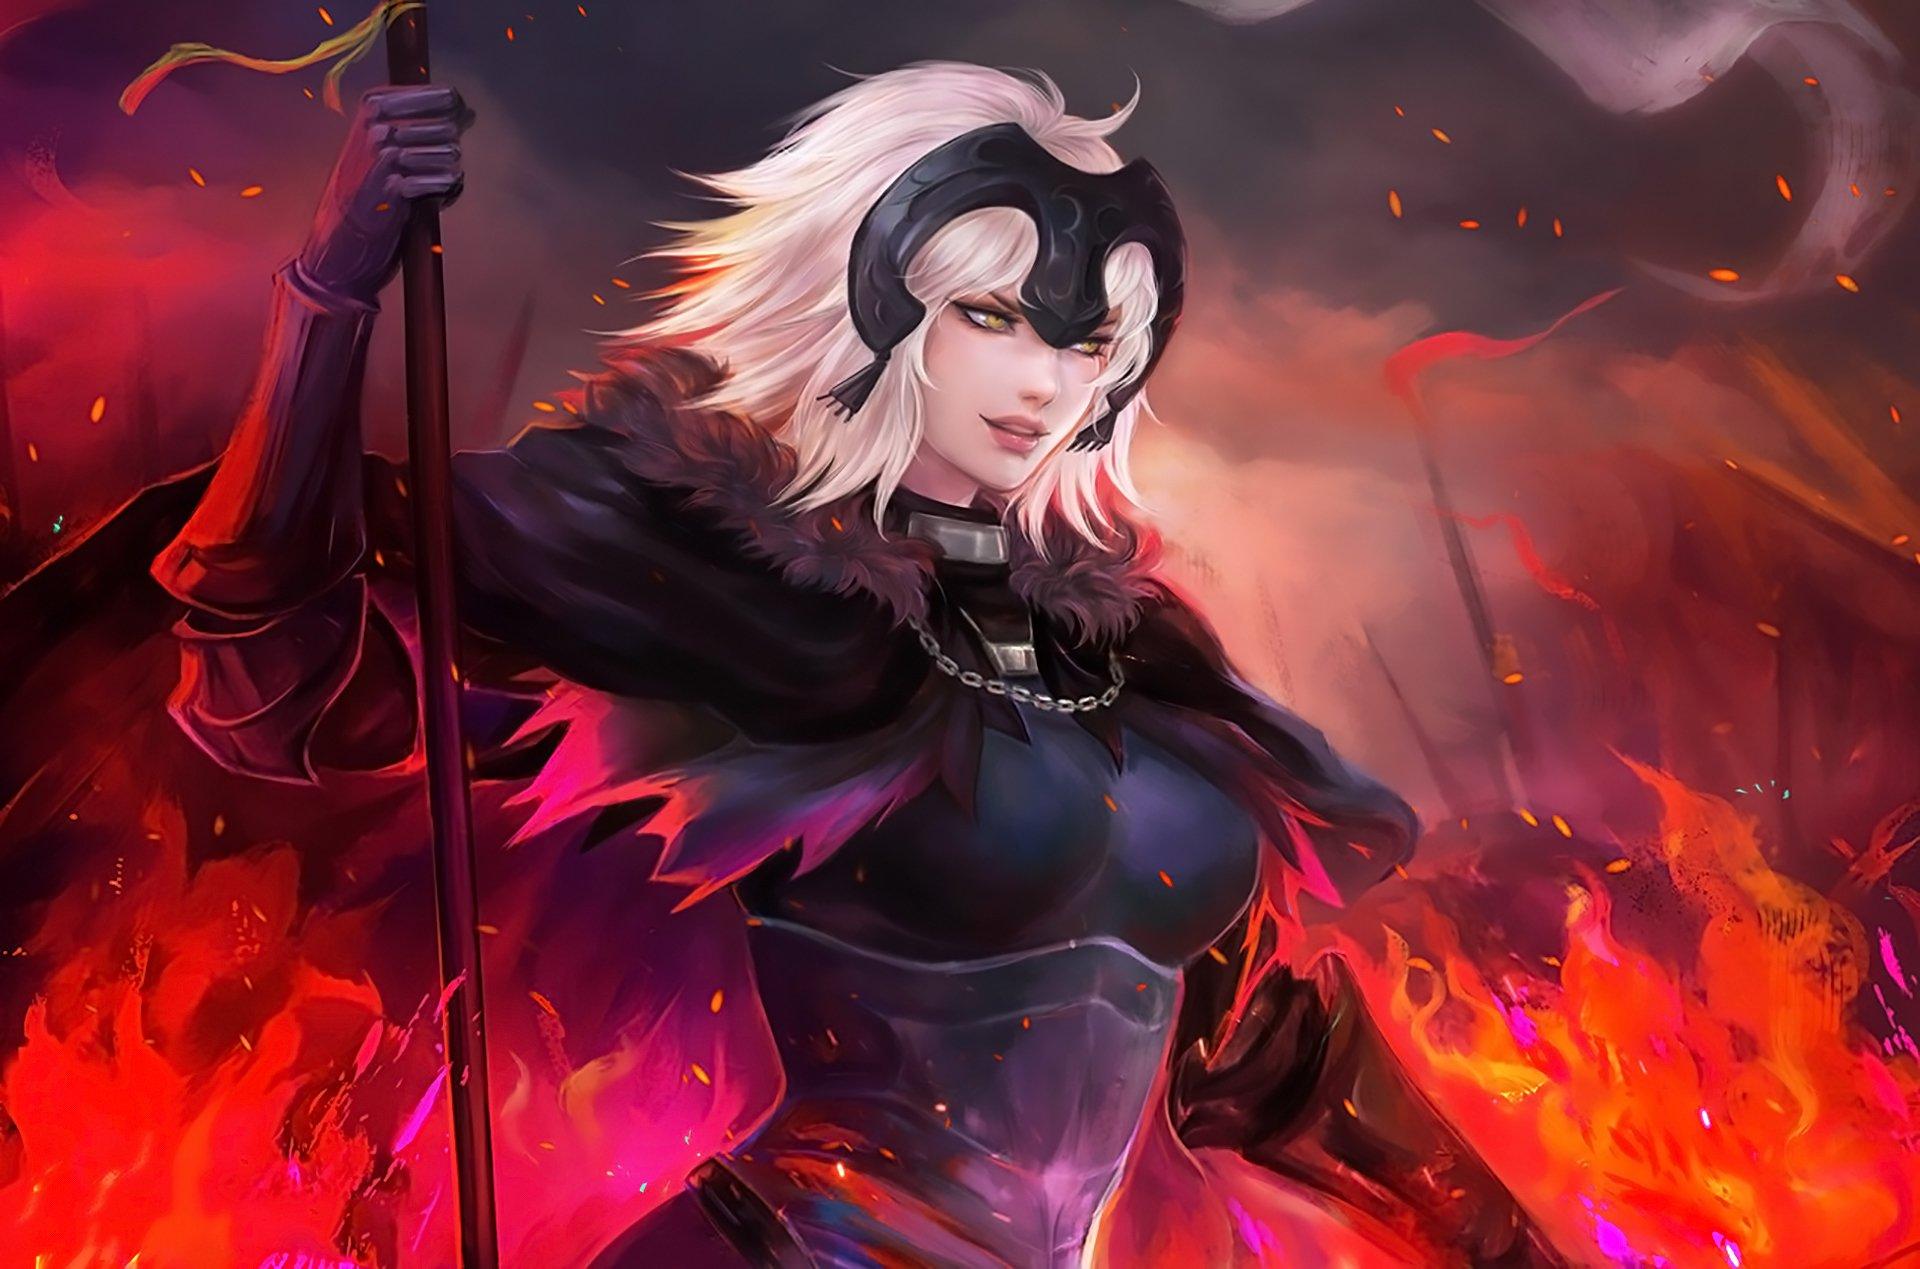 Fondos de pantalla Anime Jeanne de Fate Grand Order